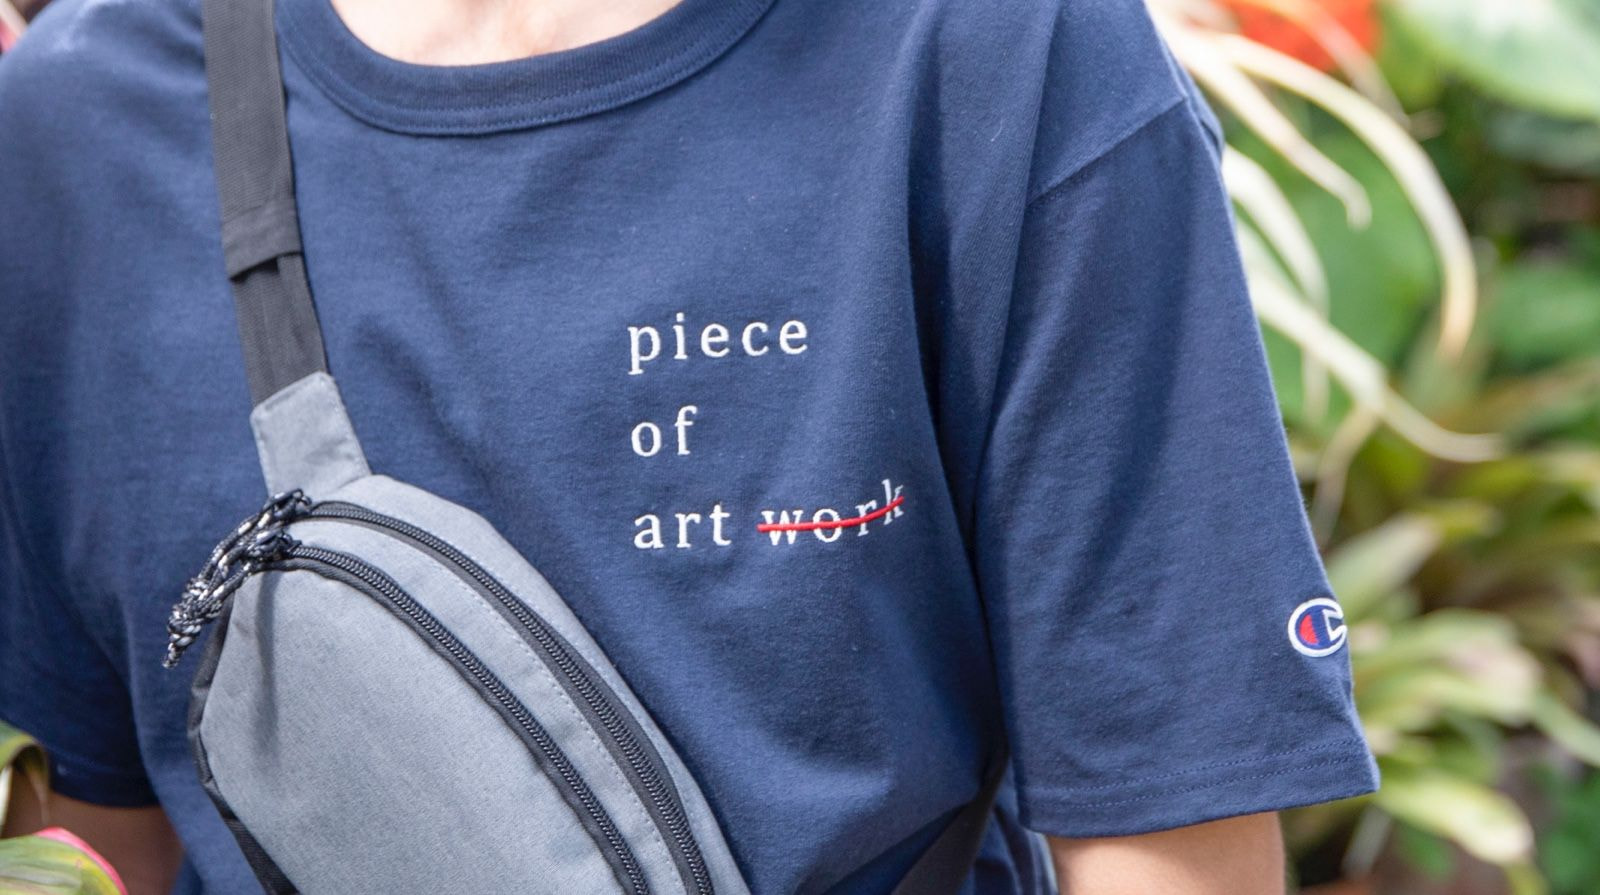 Creative t-shirt design ideas